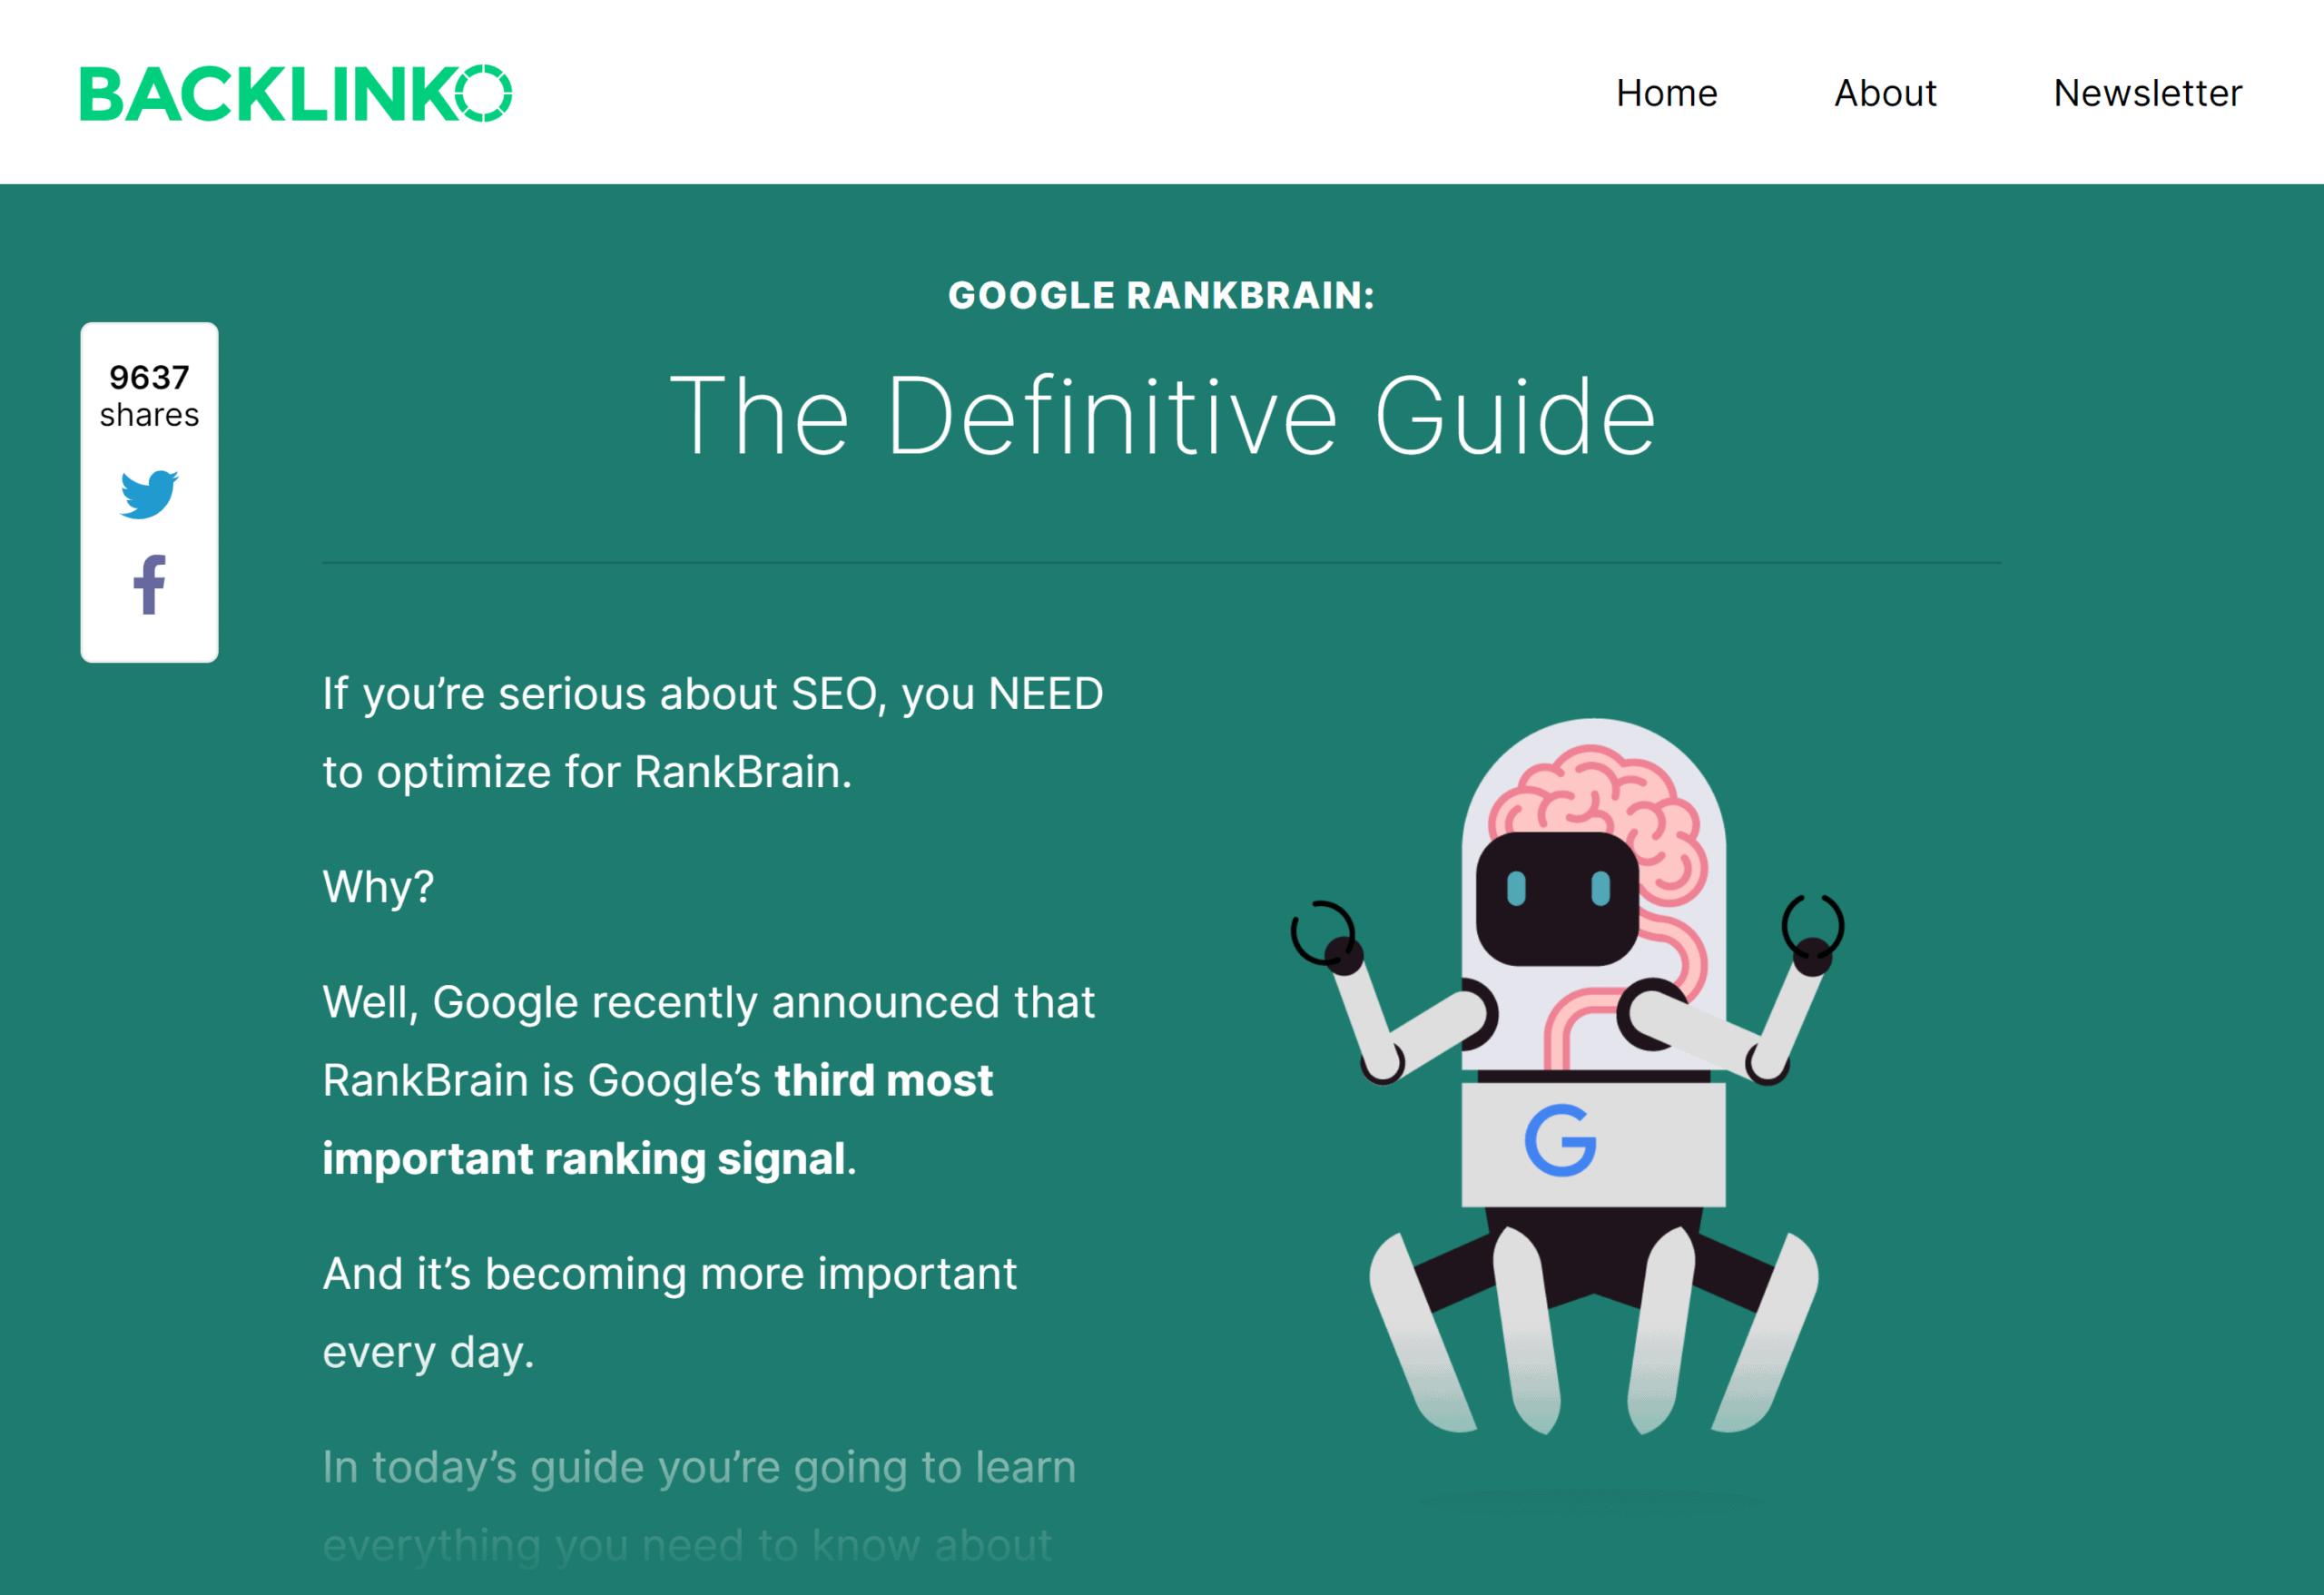 Backlinko – Google RankBrain SEO guide